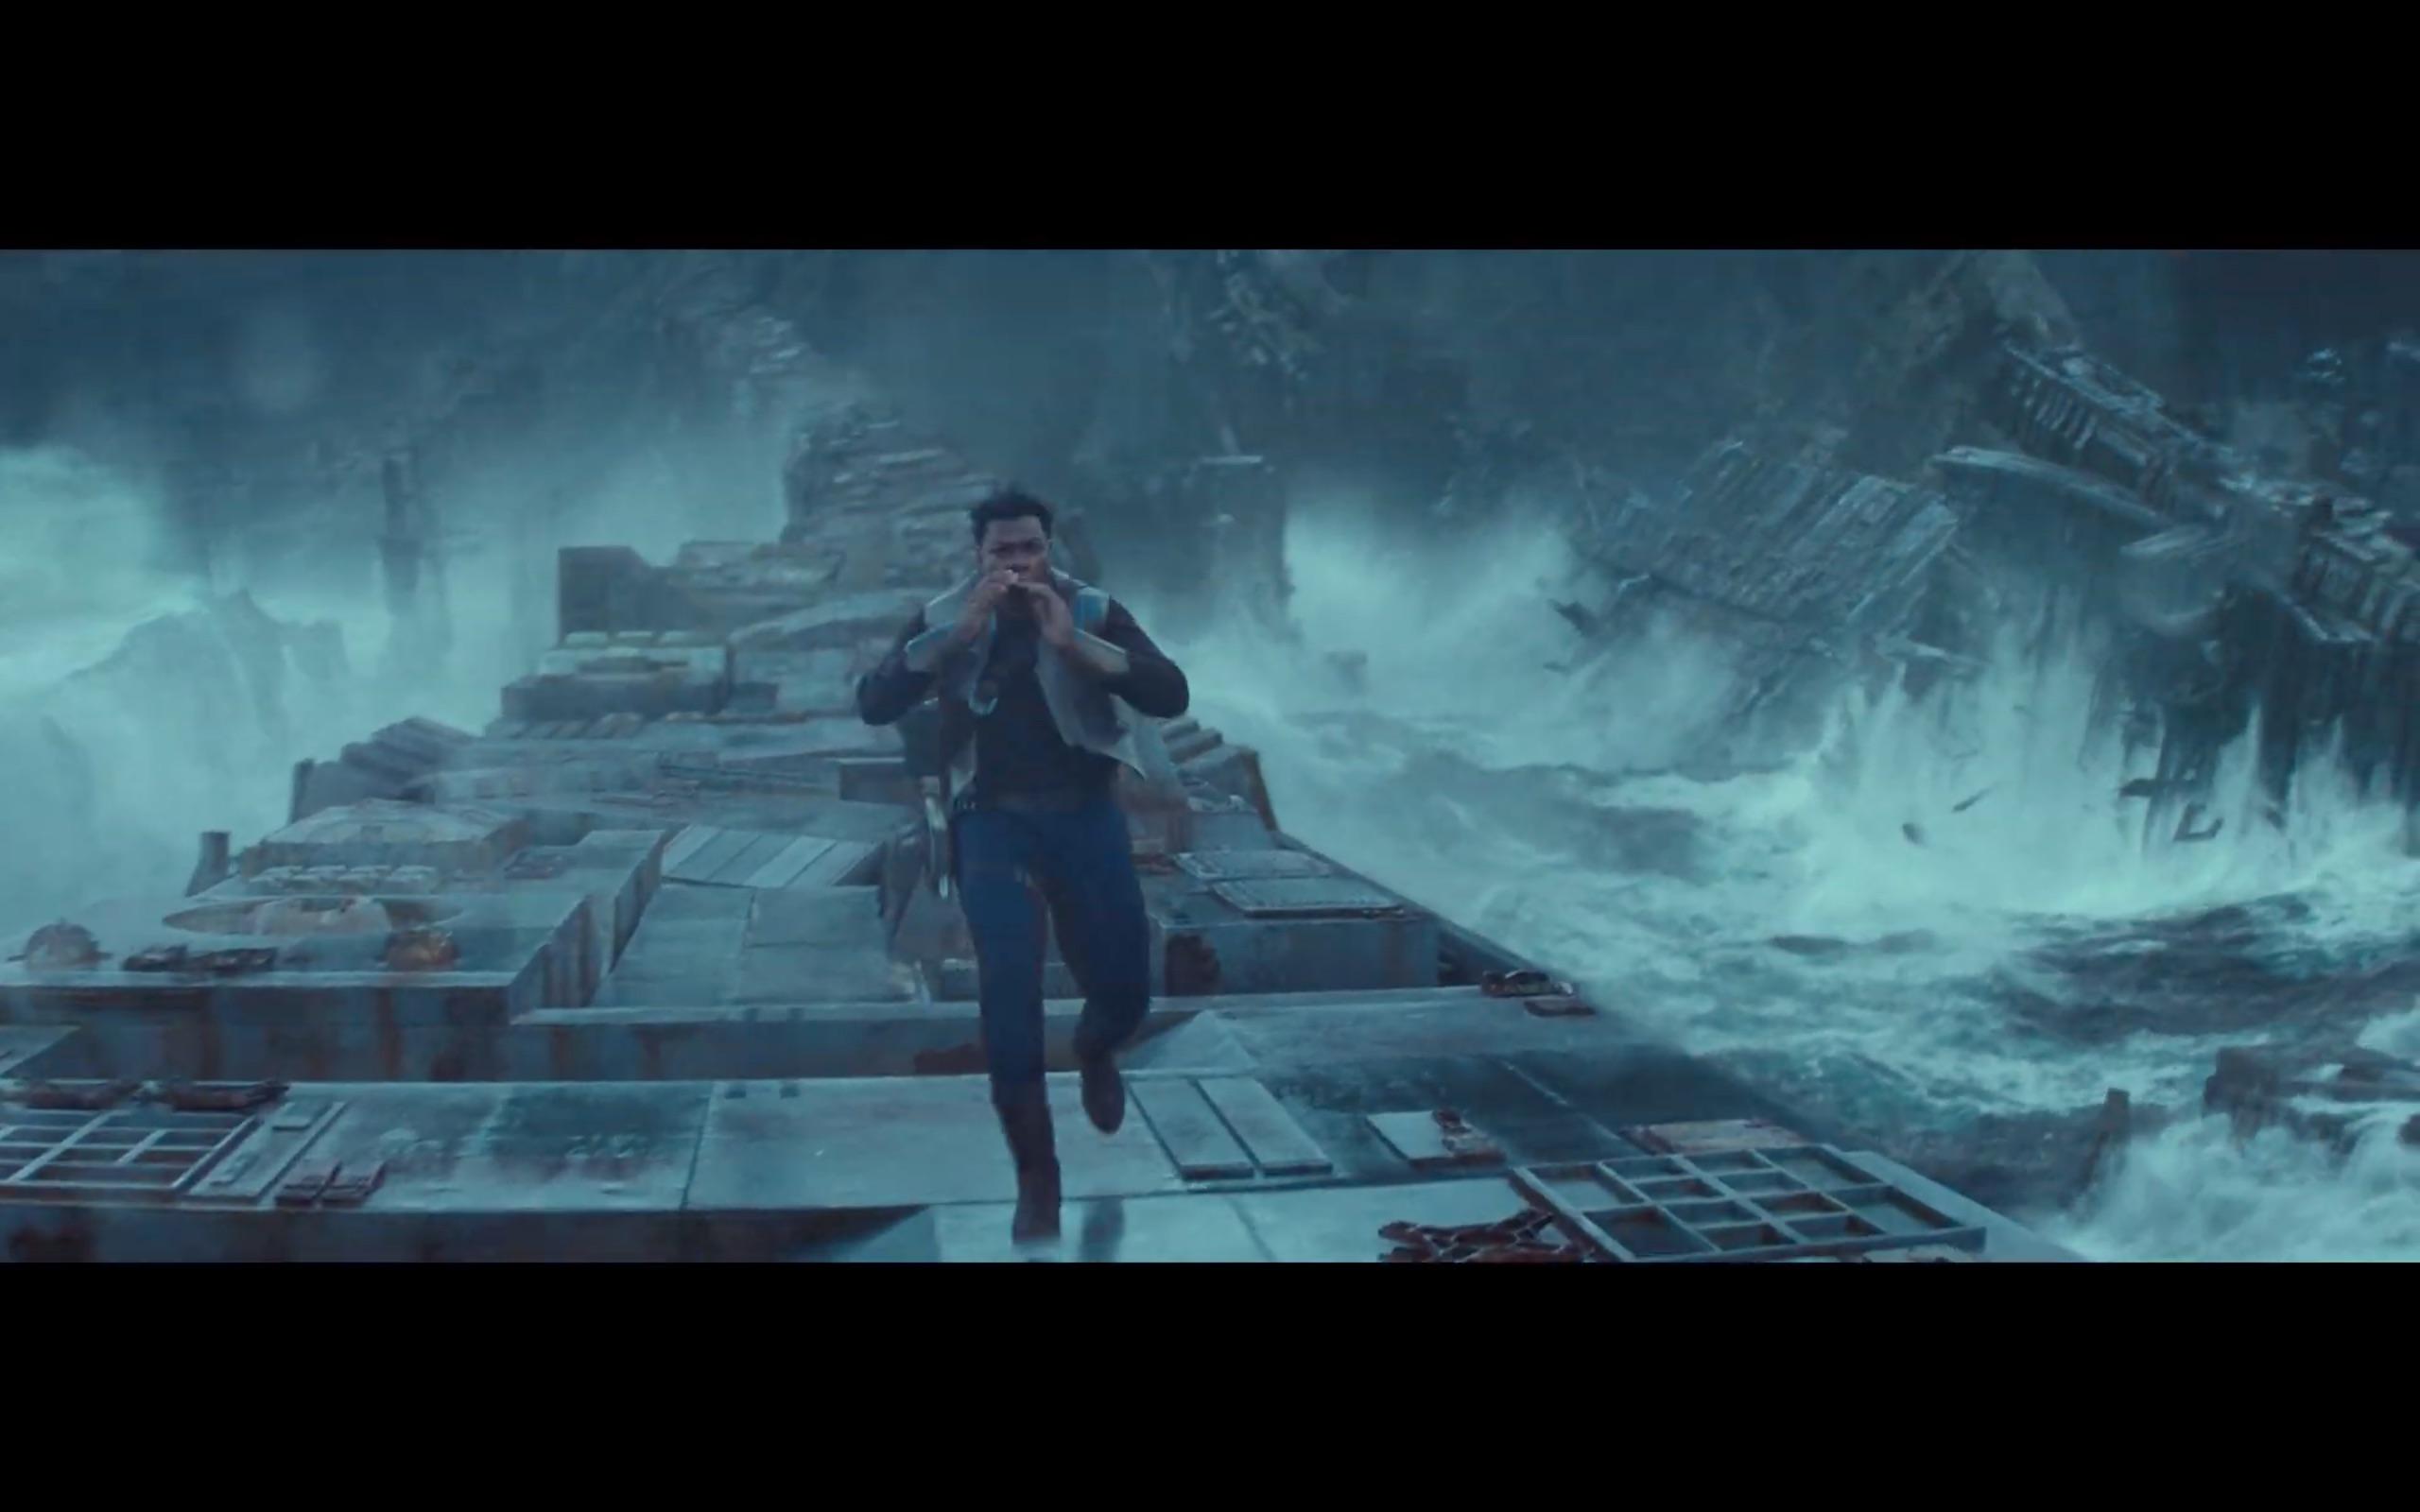 Death Star Rise Of Skywalker 2560x1600 Wallpaper Teahub Io